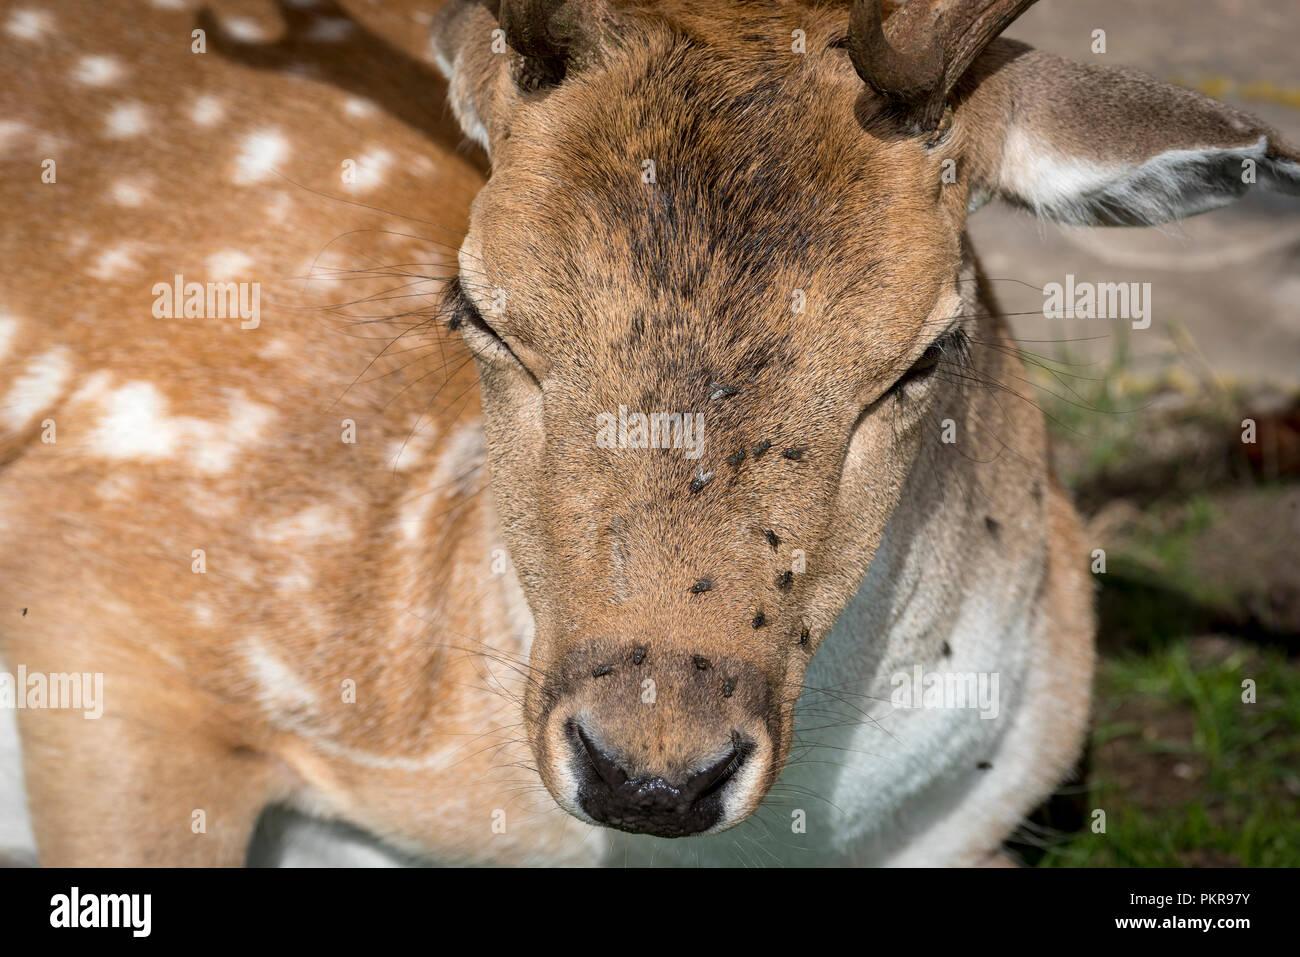 Fallow deer. - Stock Image